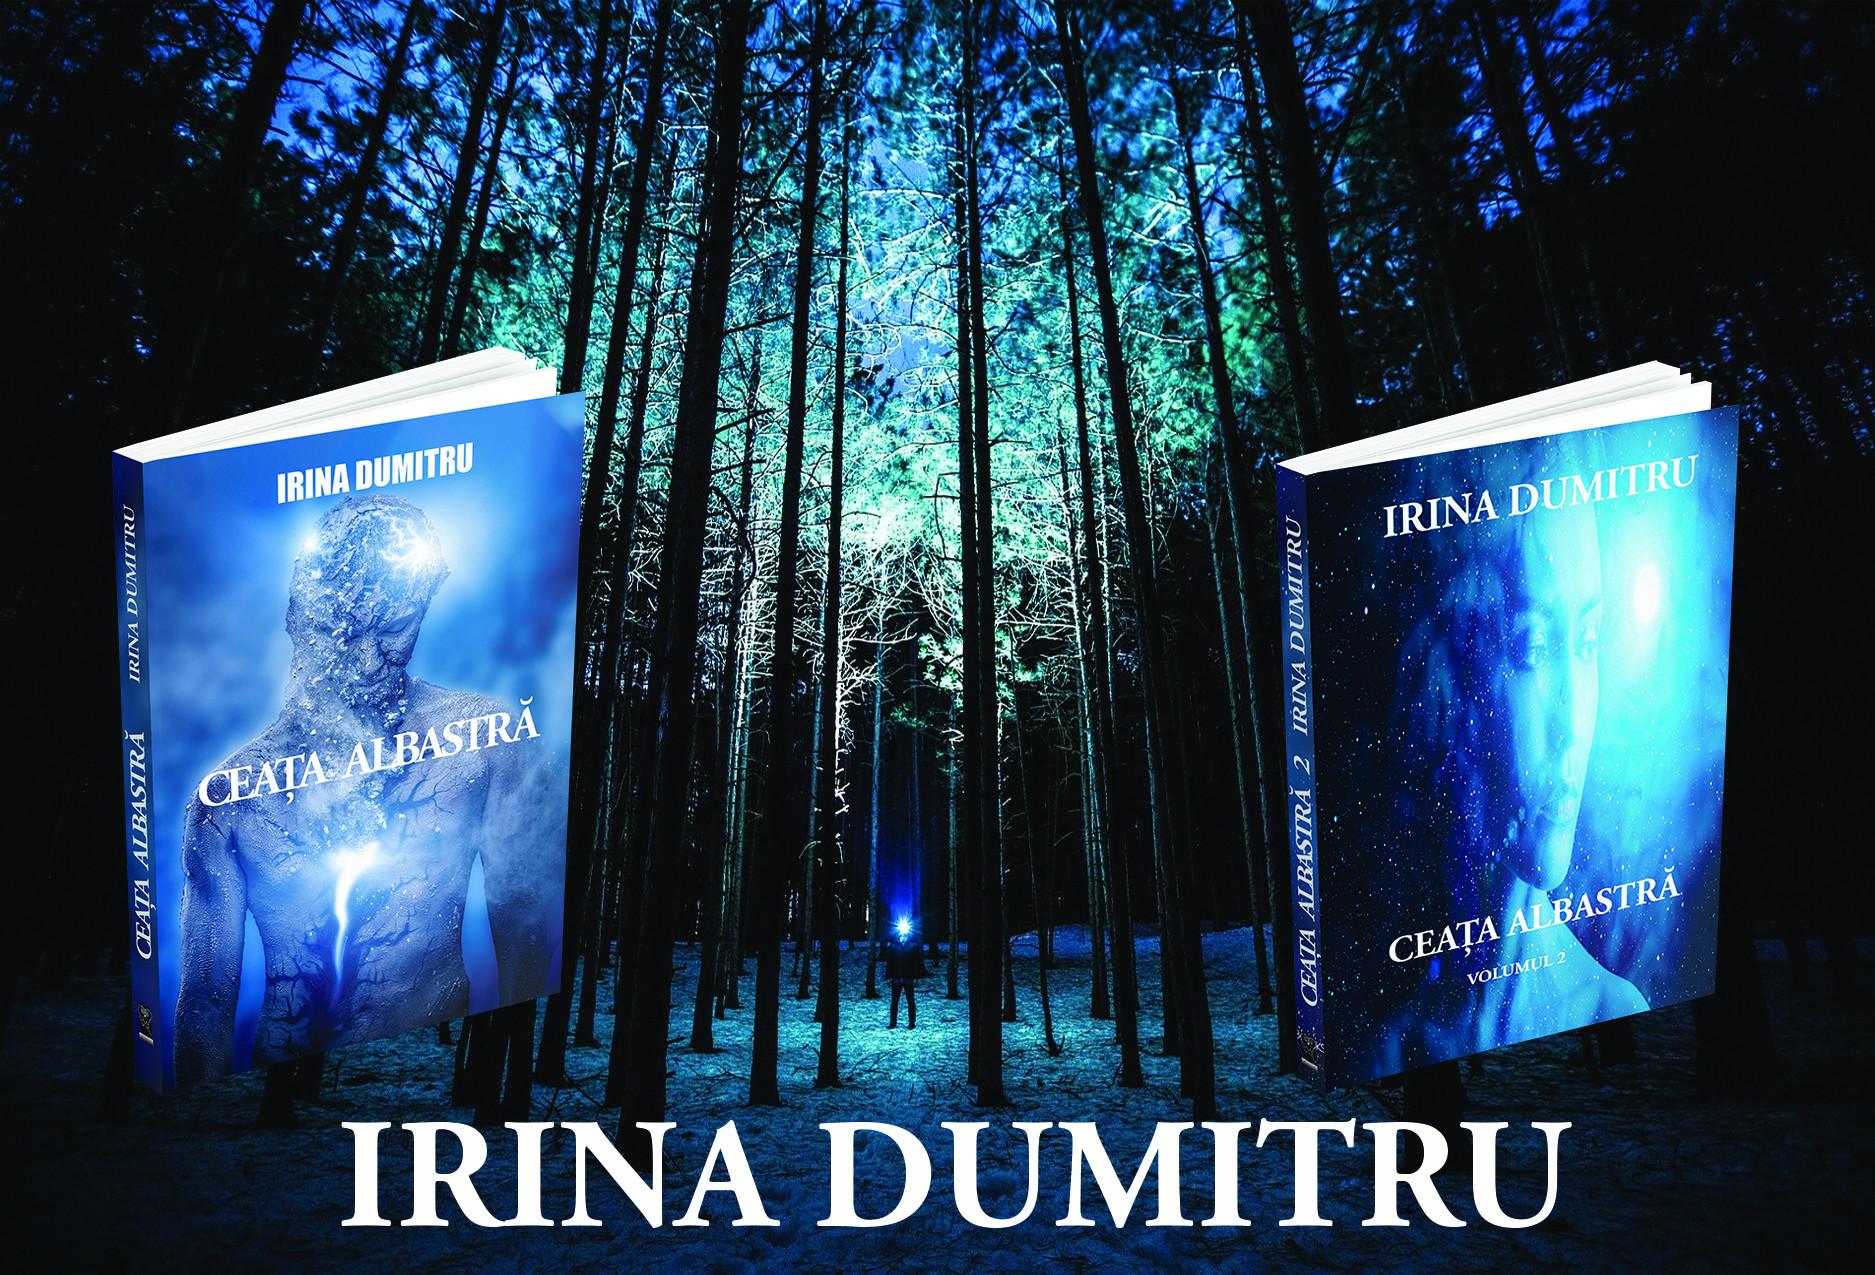 Irina Dumitru